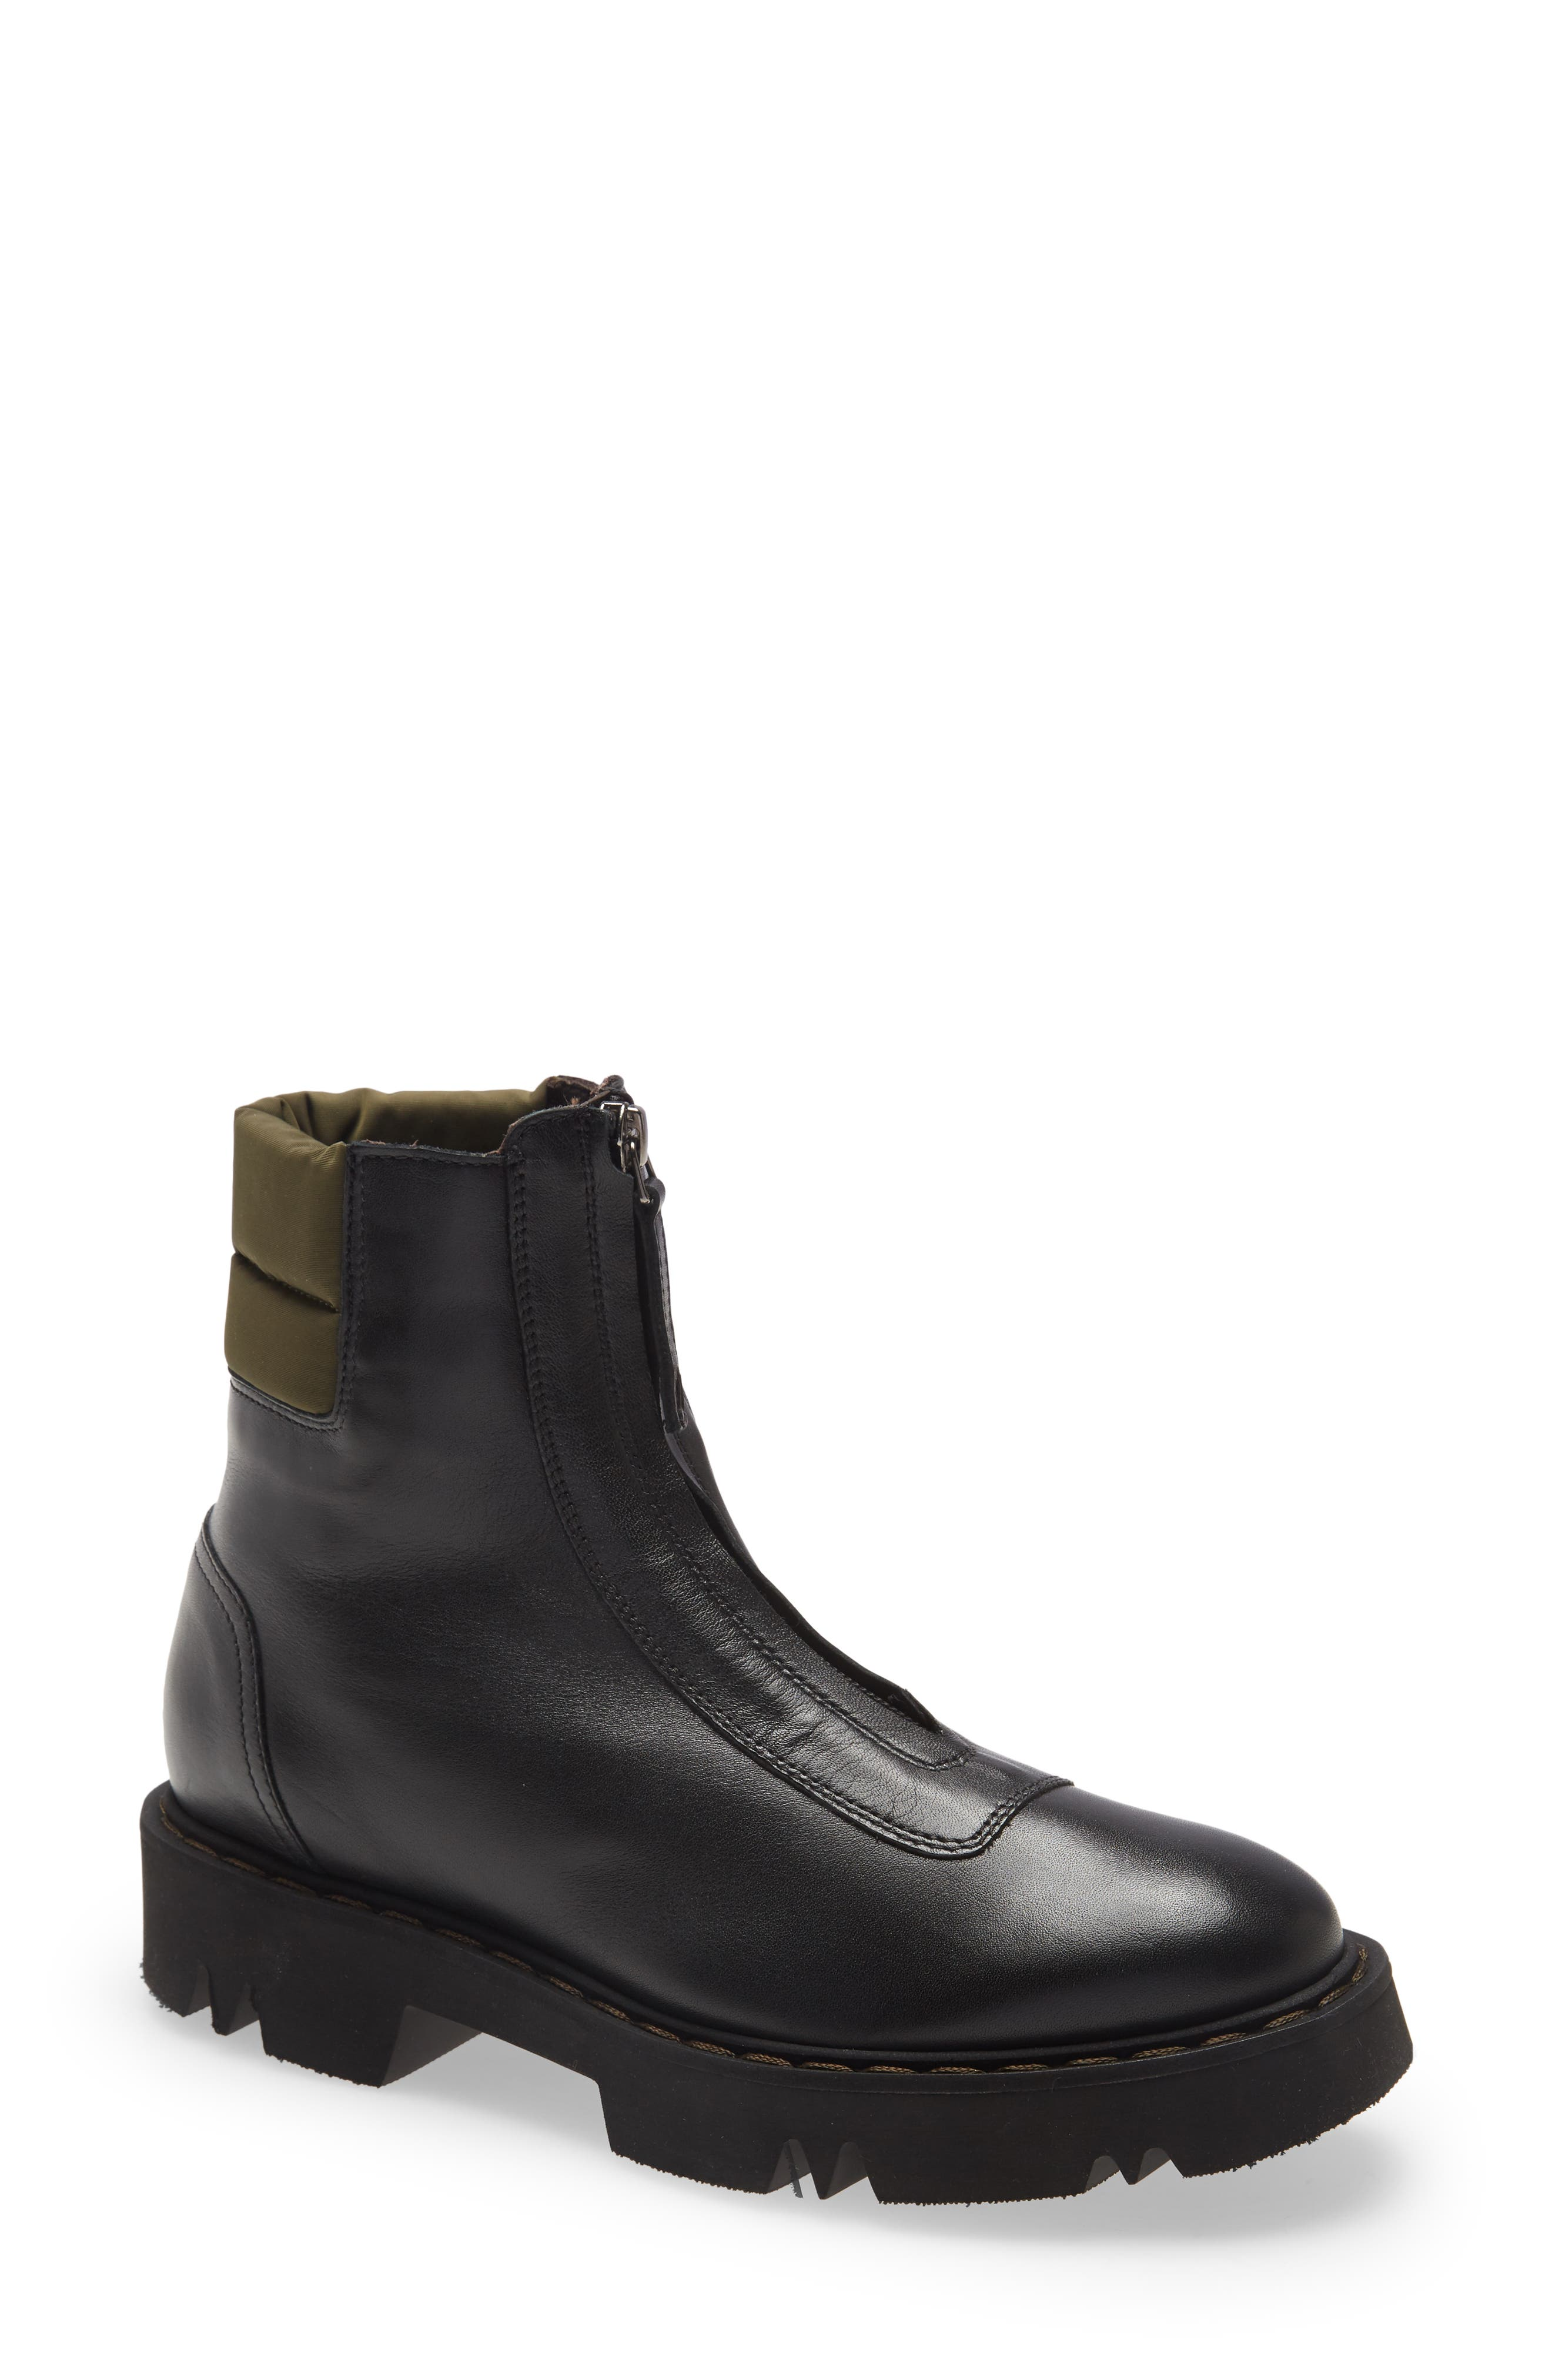 Harlo Waterproof Leather Boot